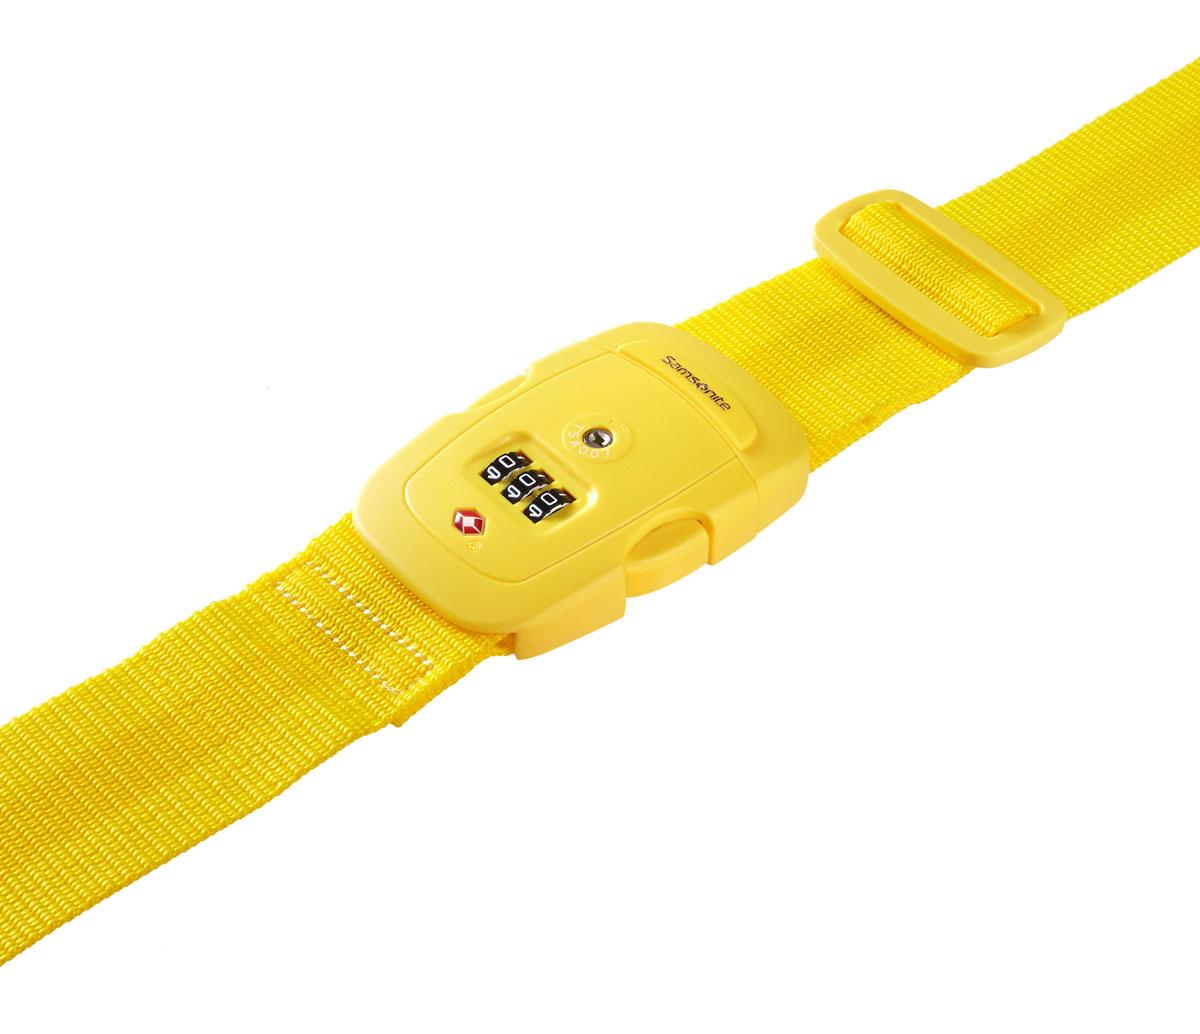 Ремень багажный Samsonite, цвет: желтый. U23*06009U23*06009